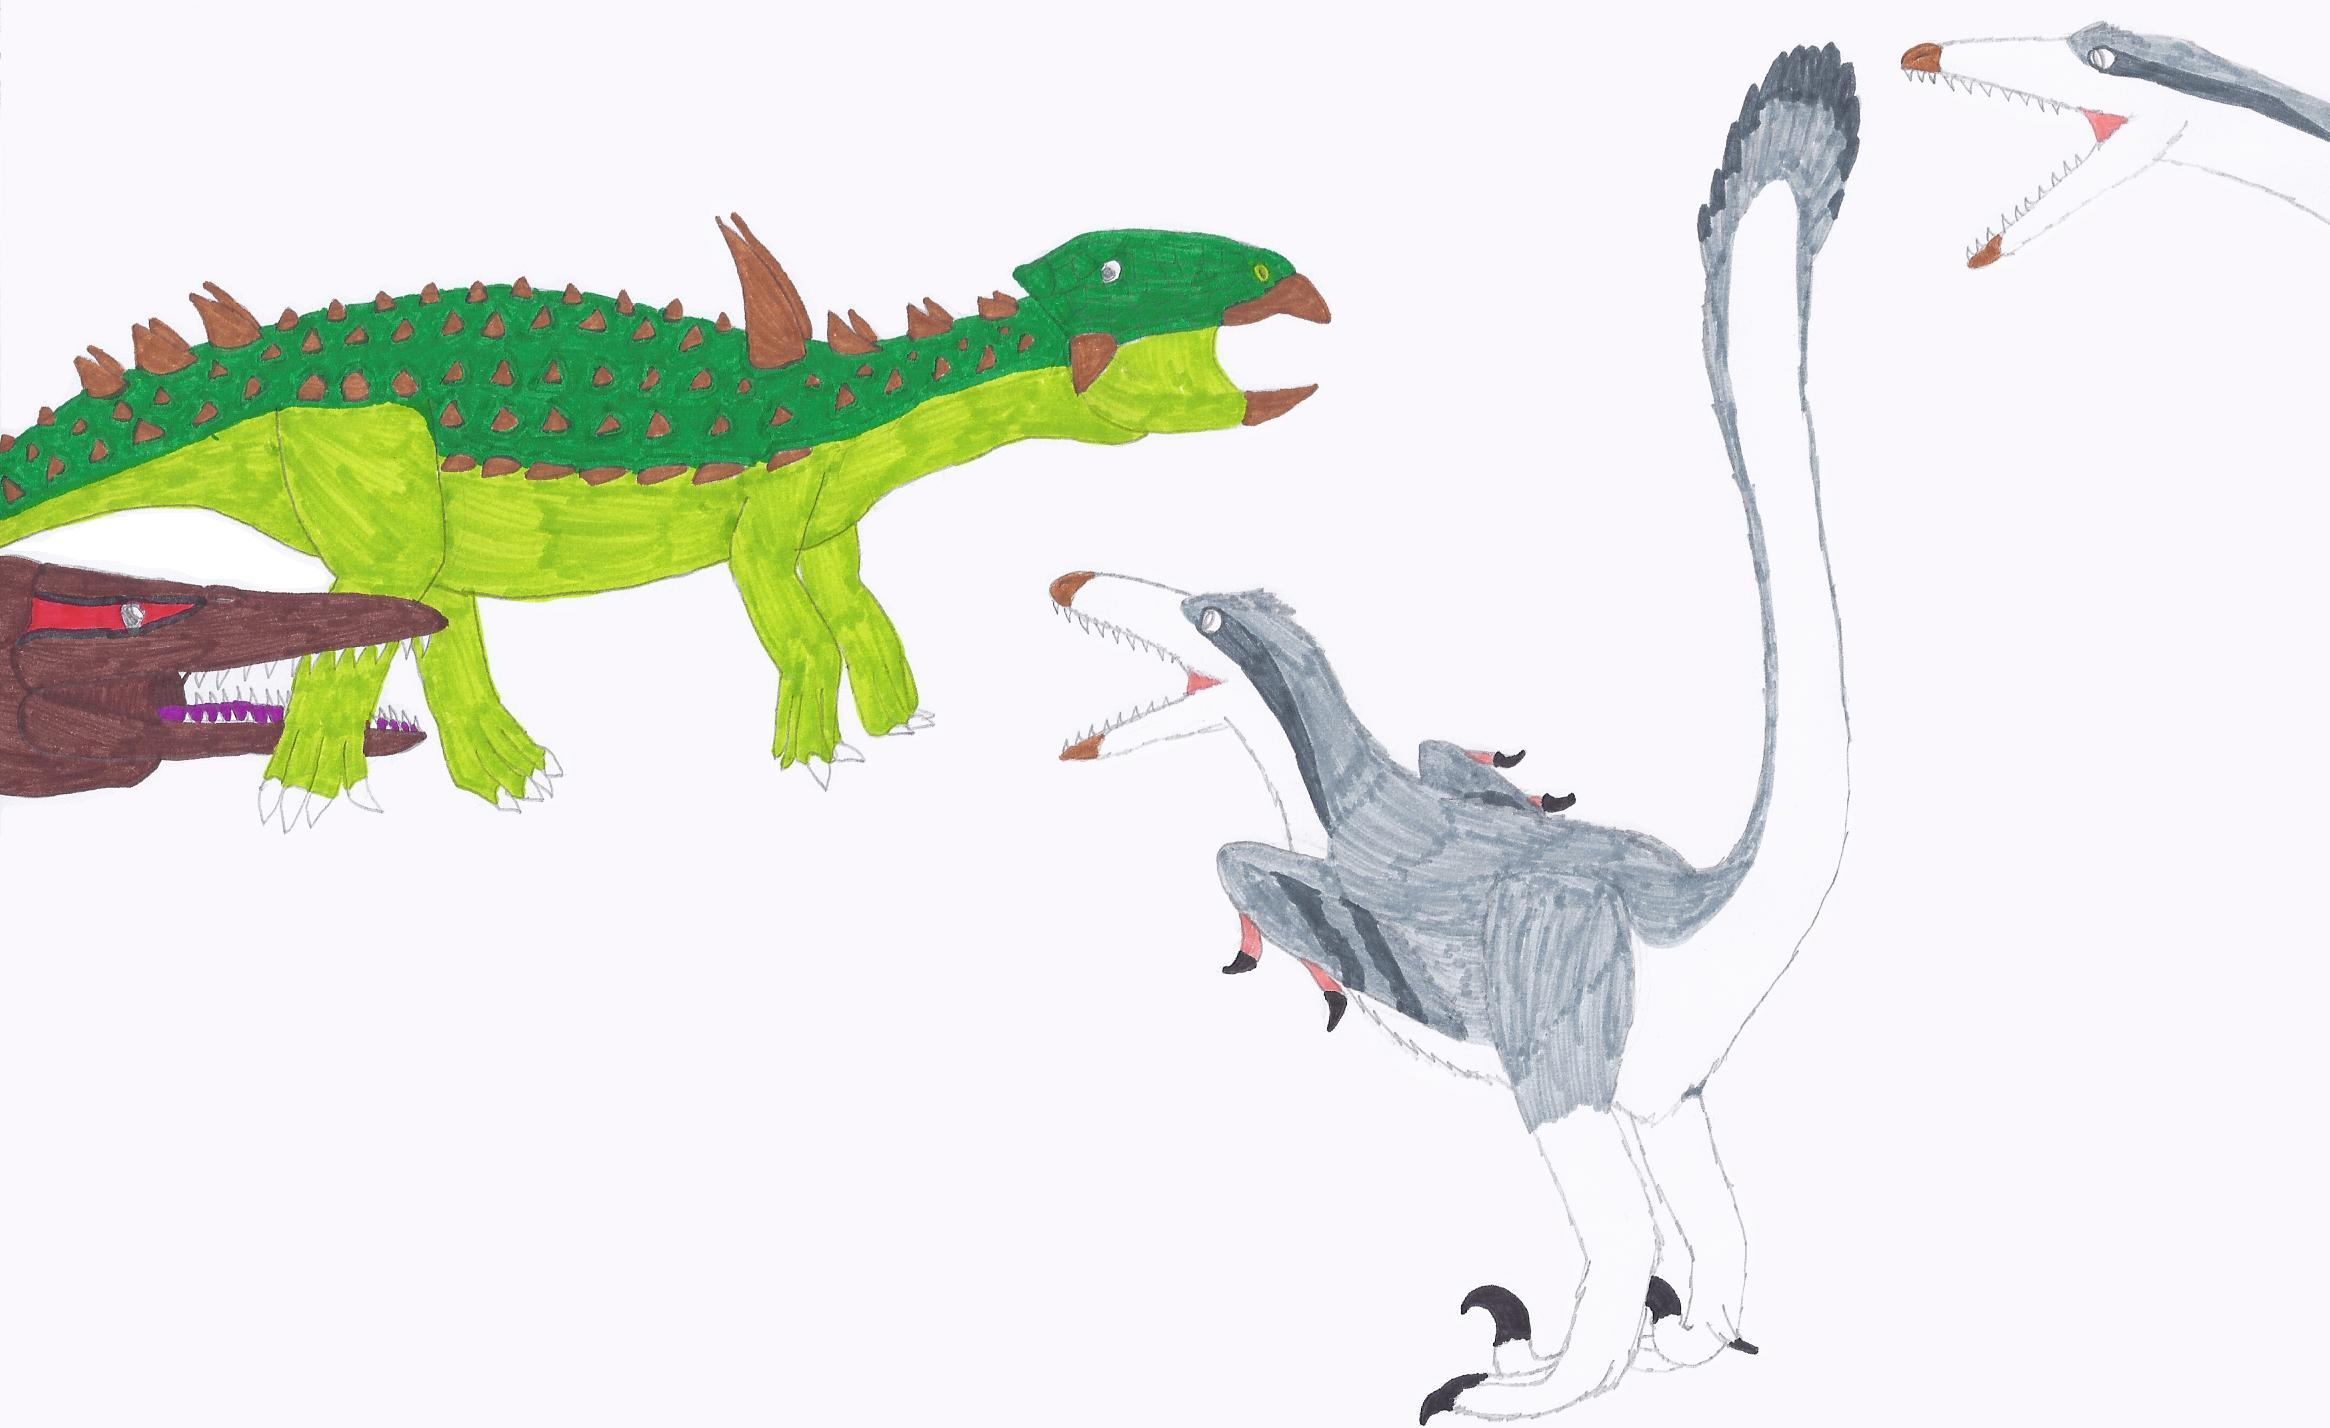 how to draw antarctic animals